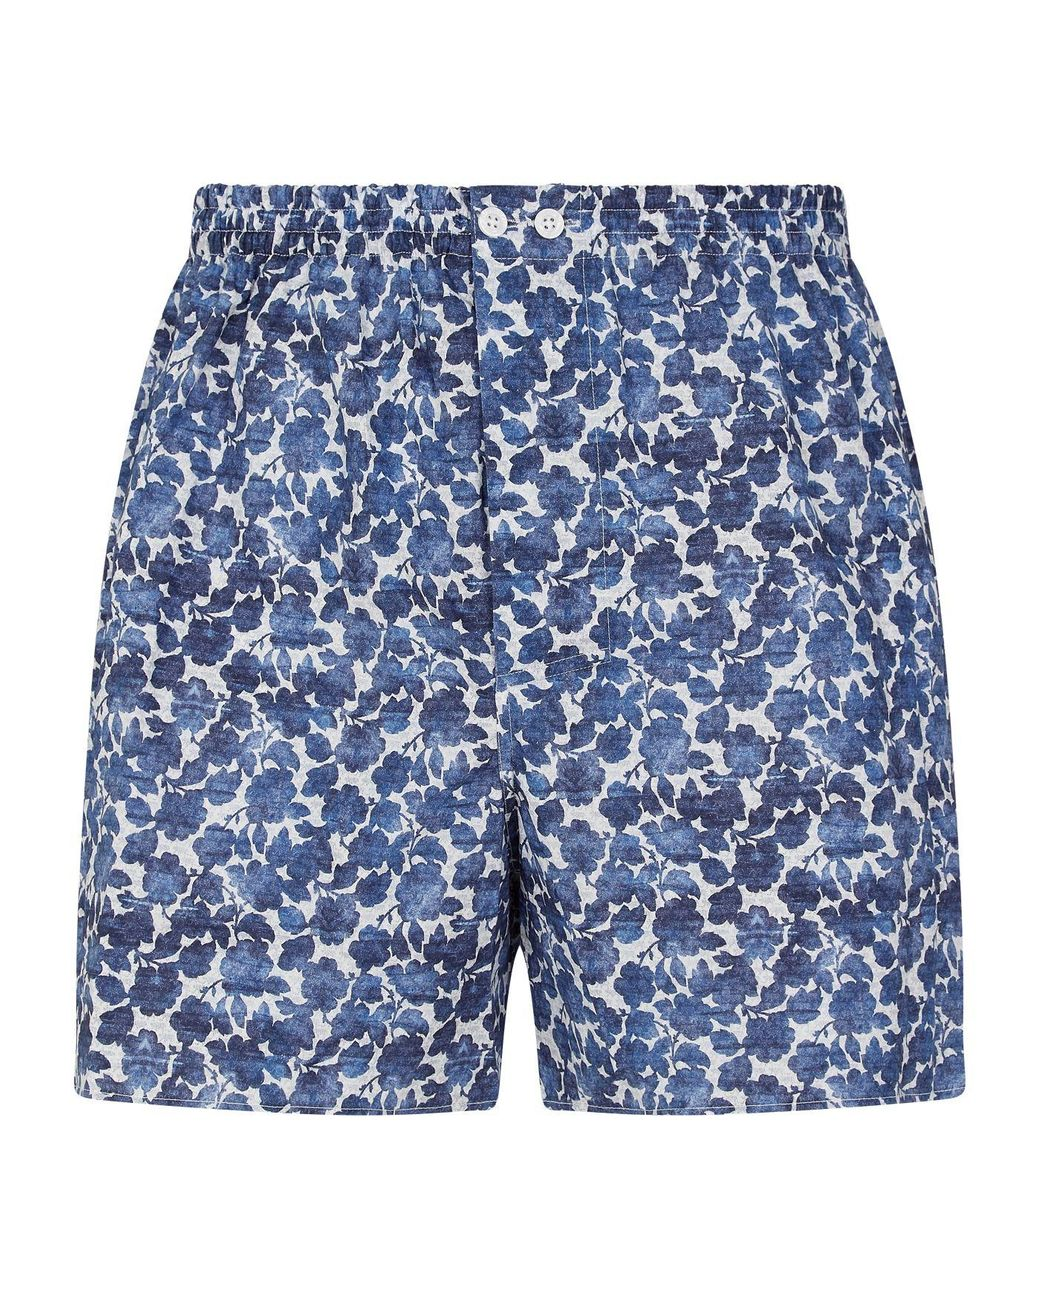 Zimmerli Mens Blue Pattern Boxers